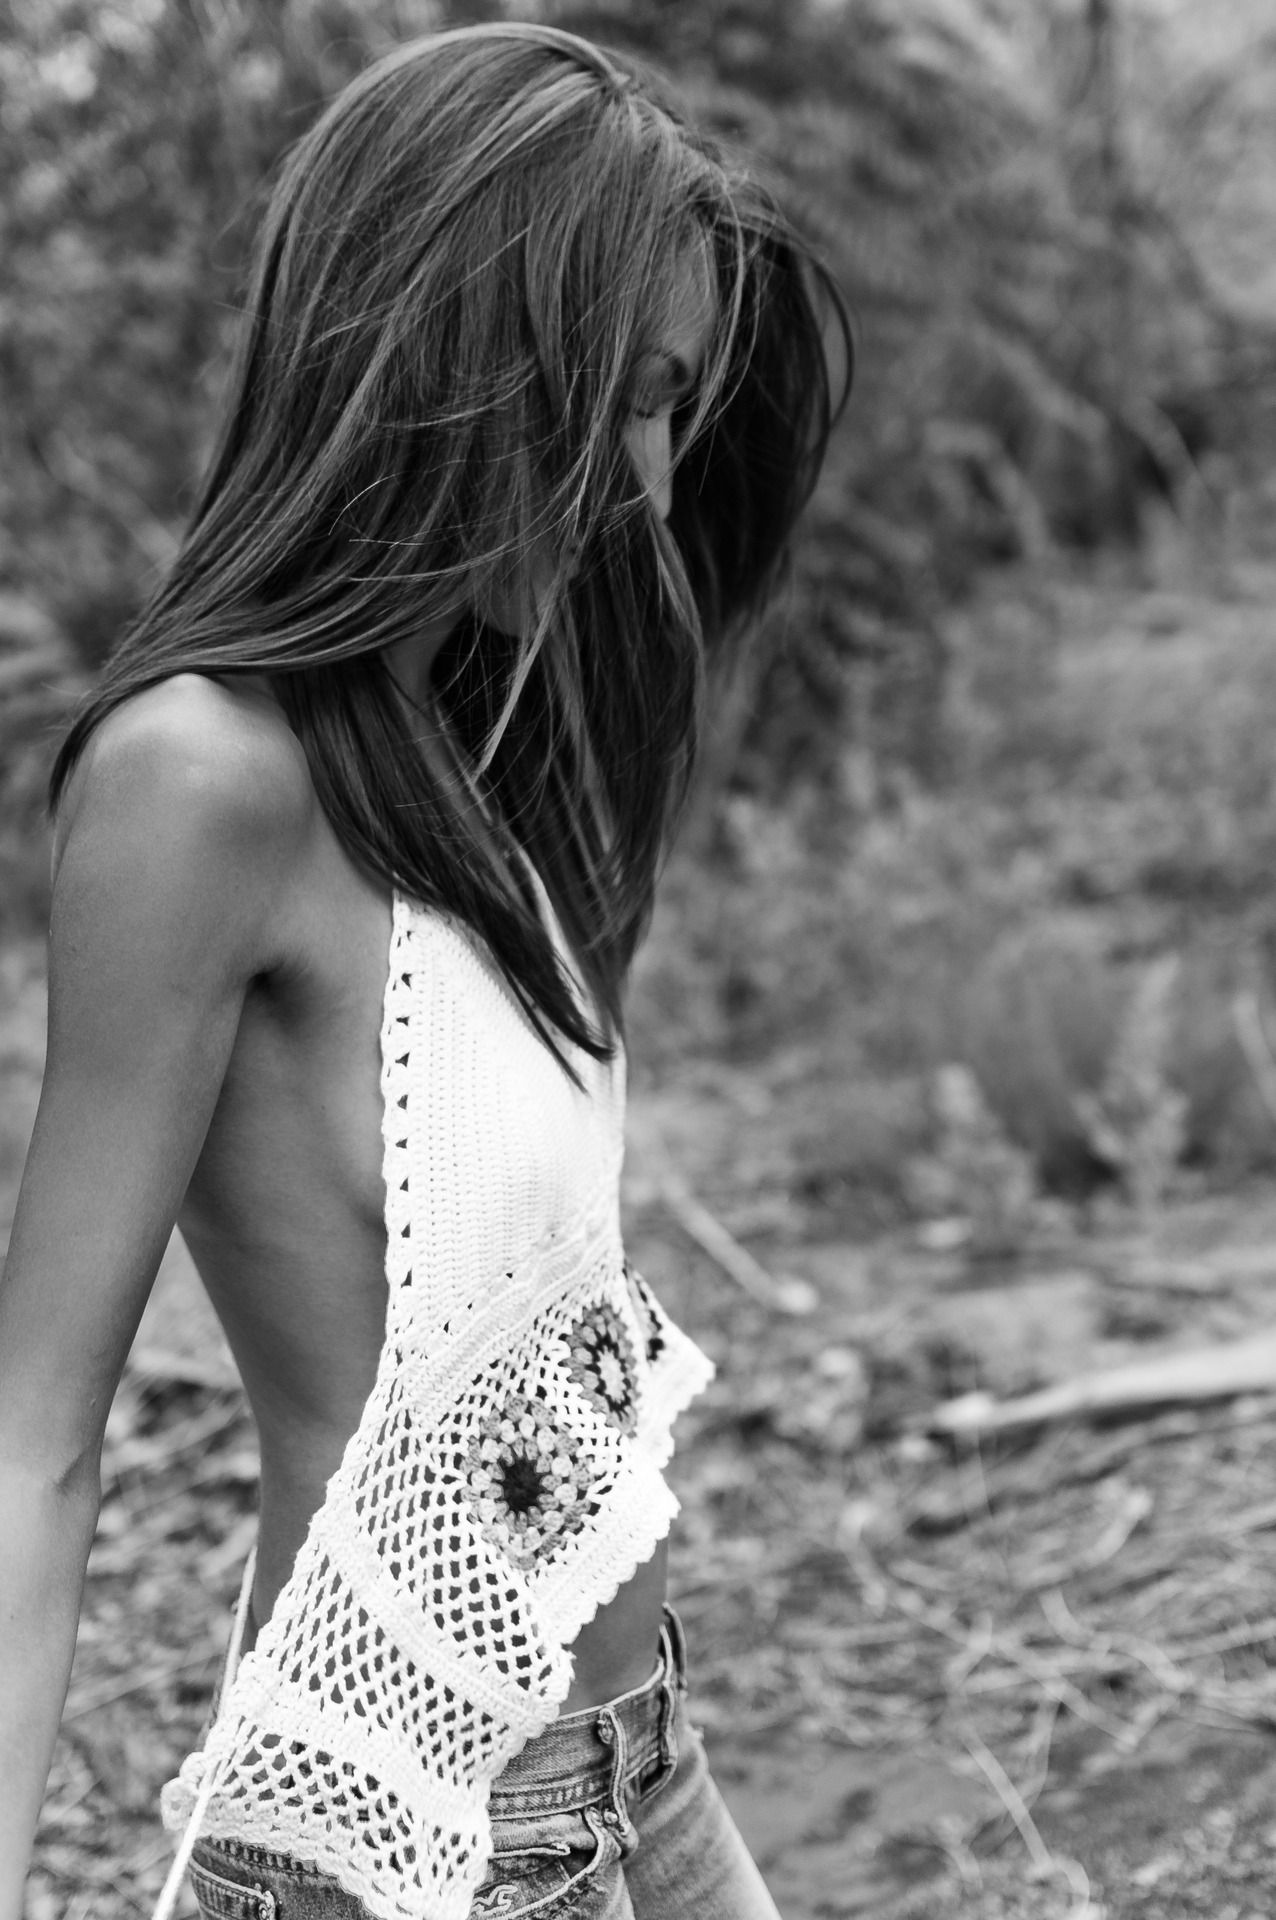 Gypsy Glamour Girl // http://www.missesdressy.com/blog/style-alert-the-gypsy-glamour-girl.html